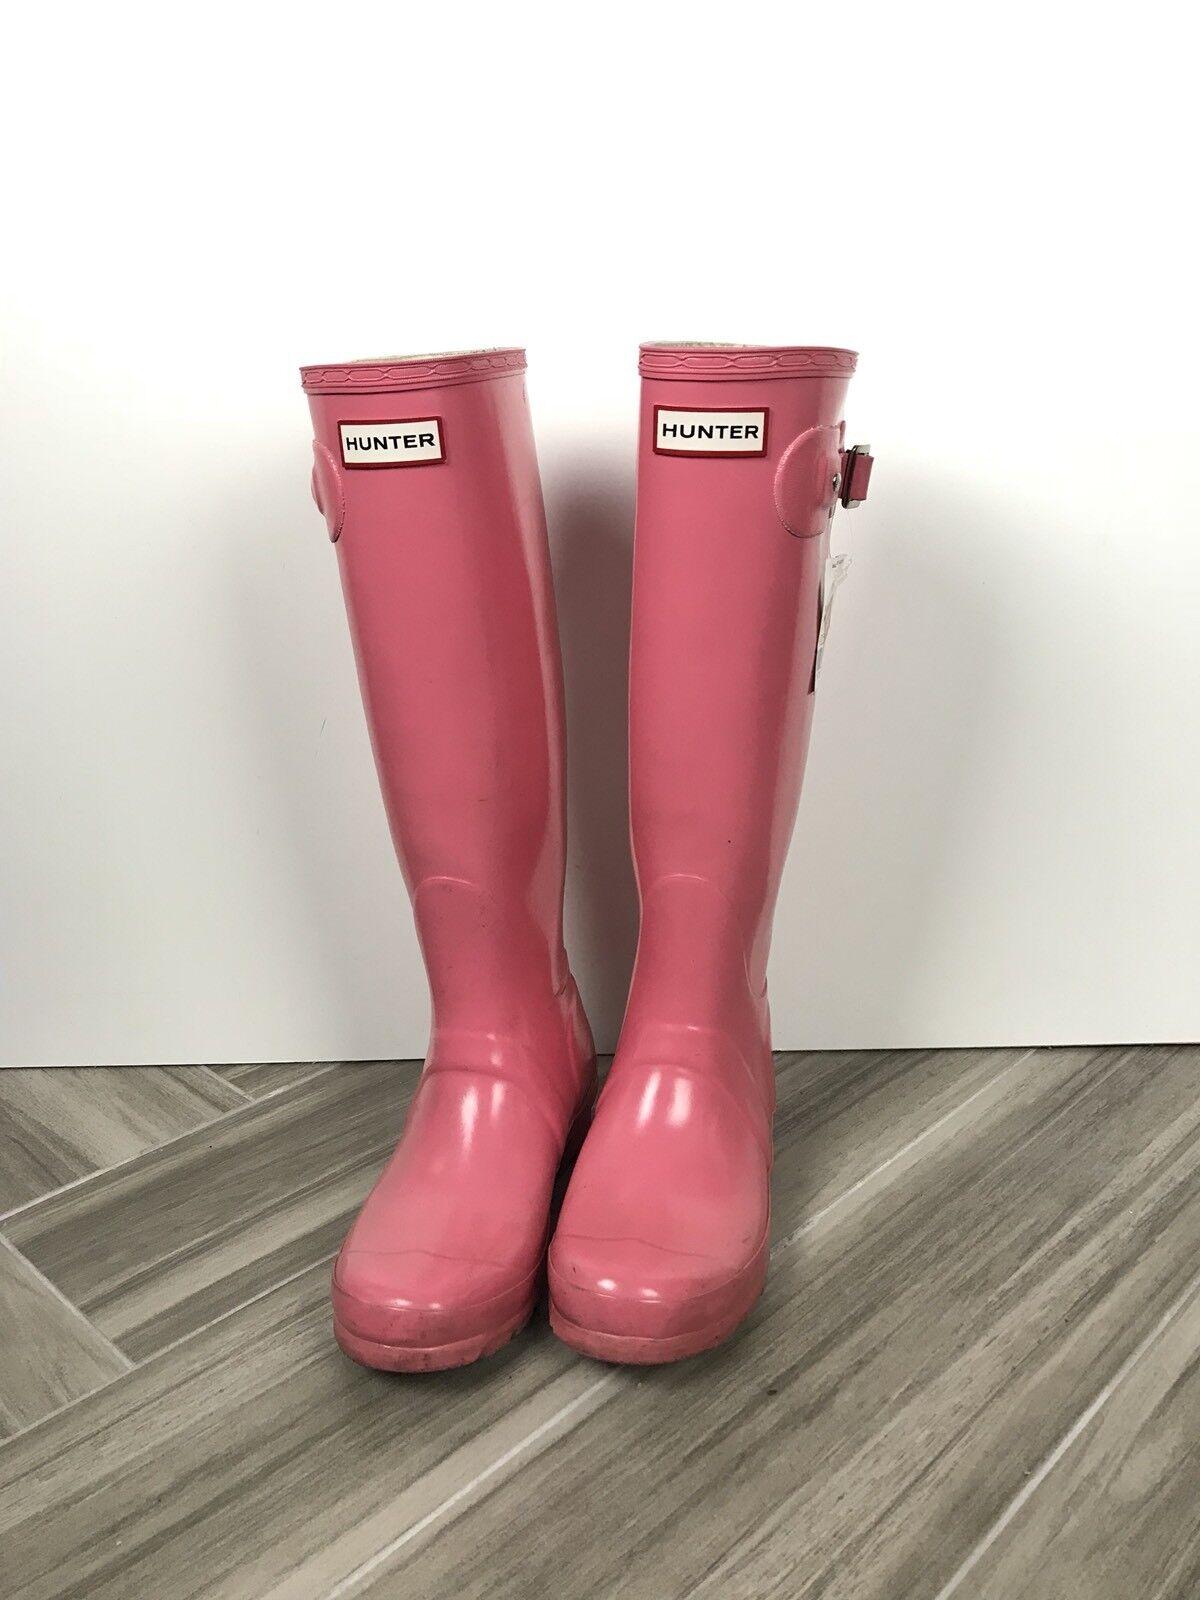 Hunter Original Gloss Tall Rain Boots Size 5 Pink Casual Winter Waterproof